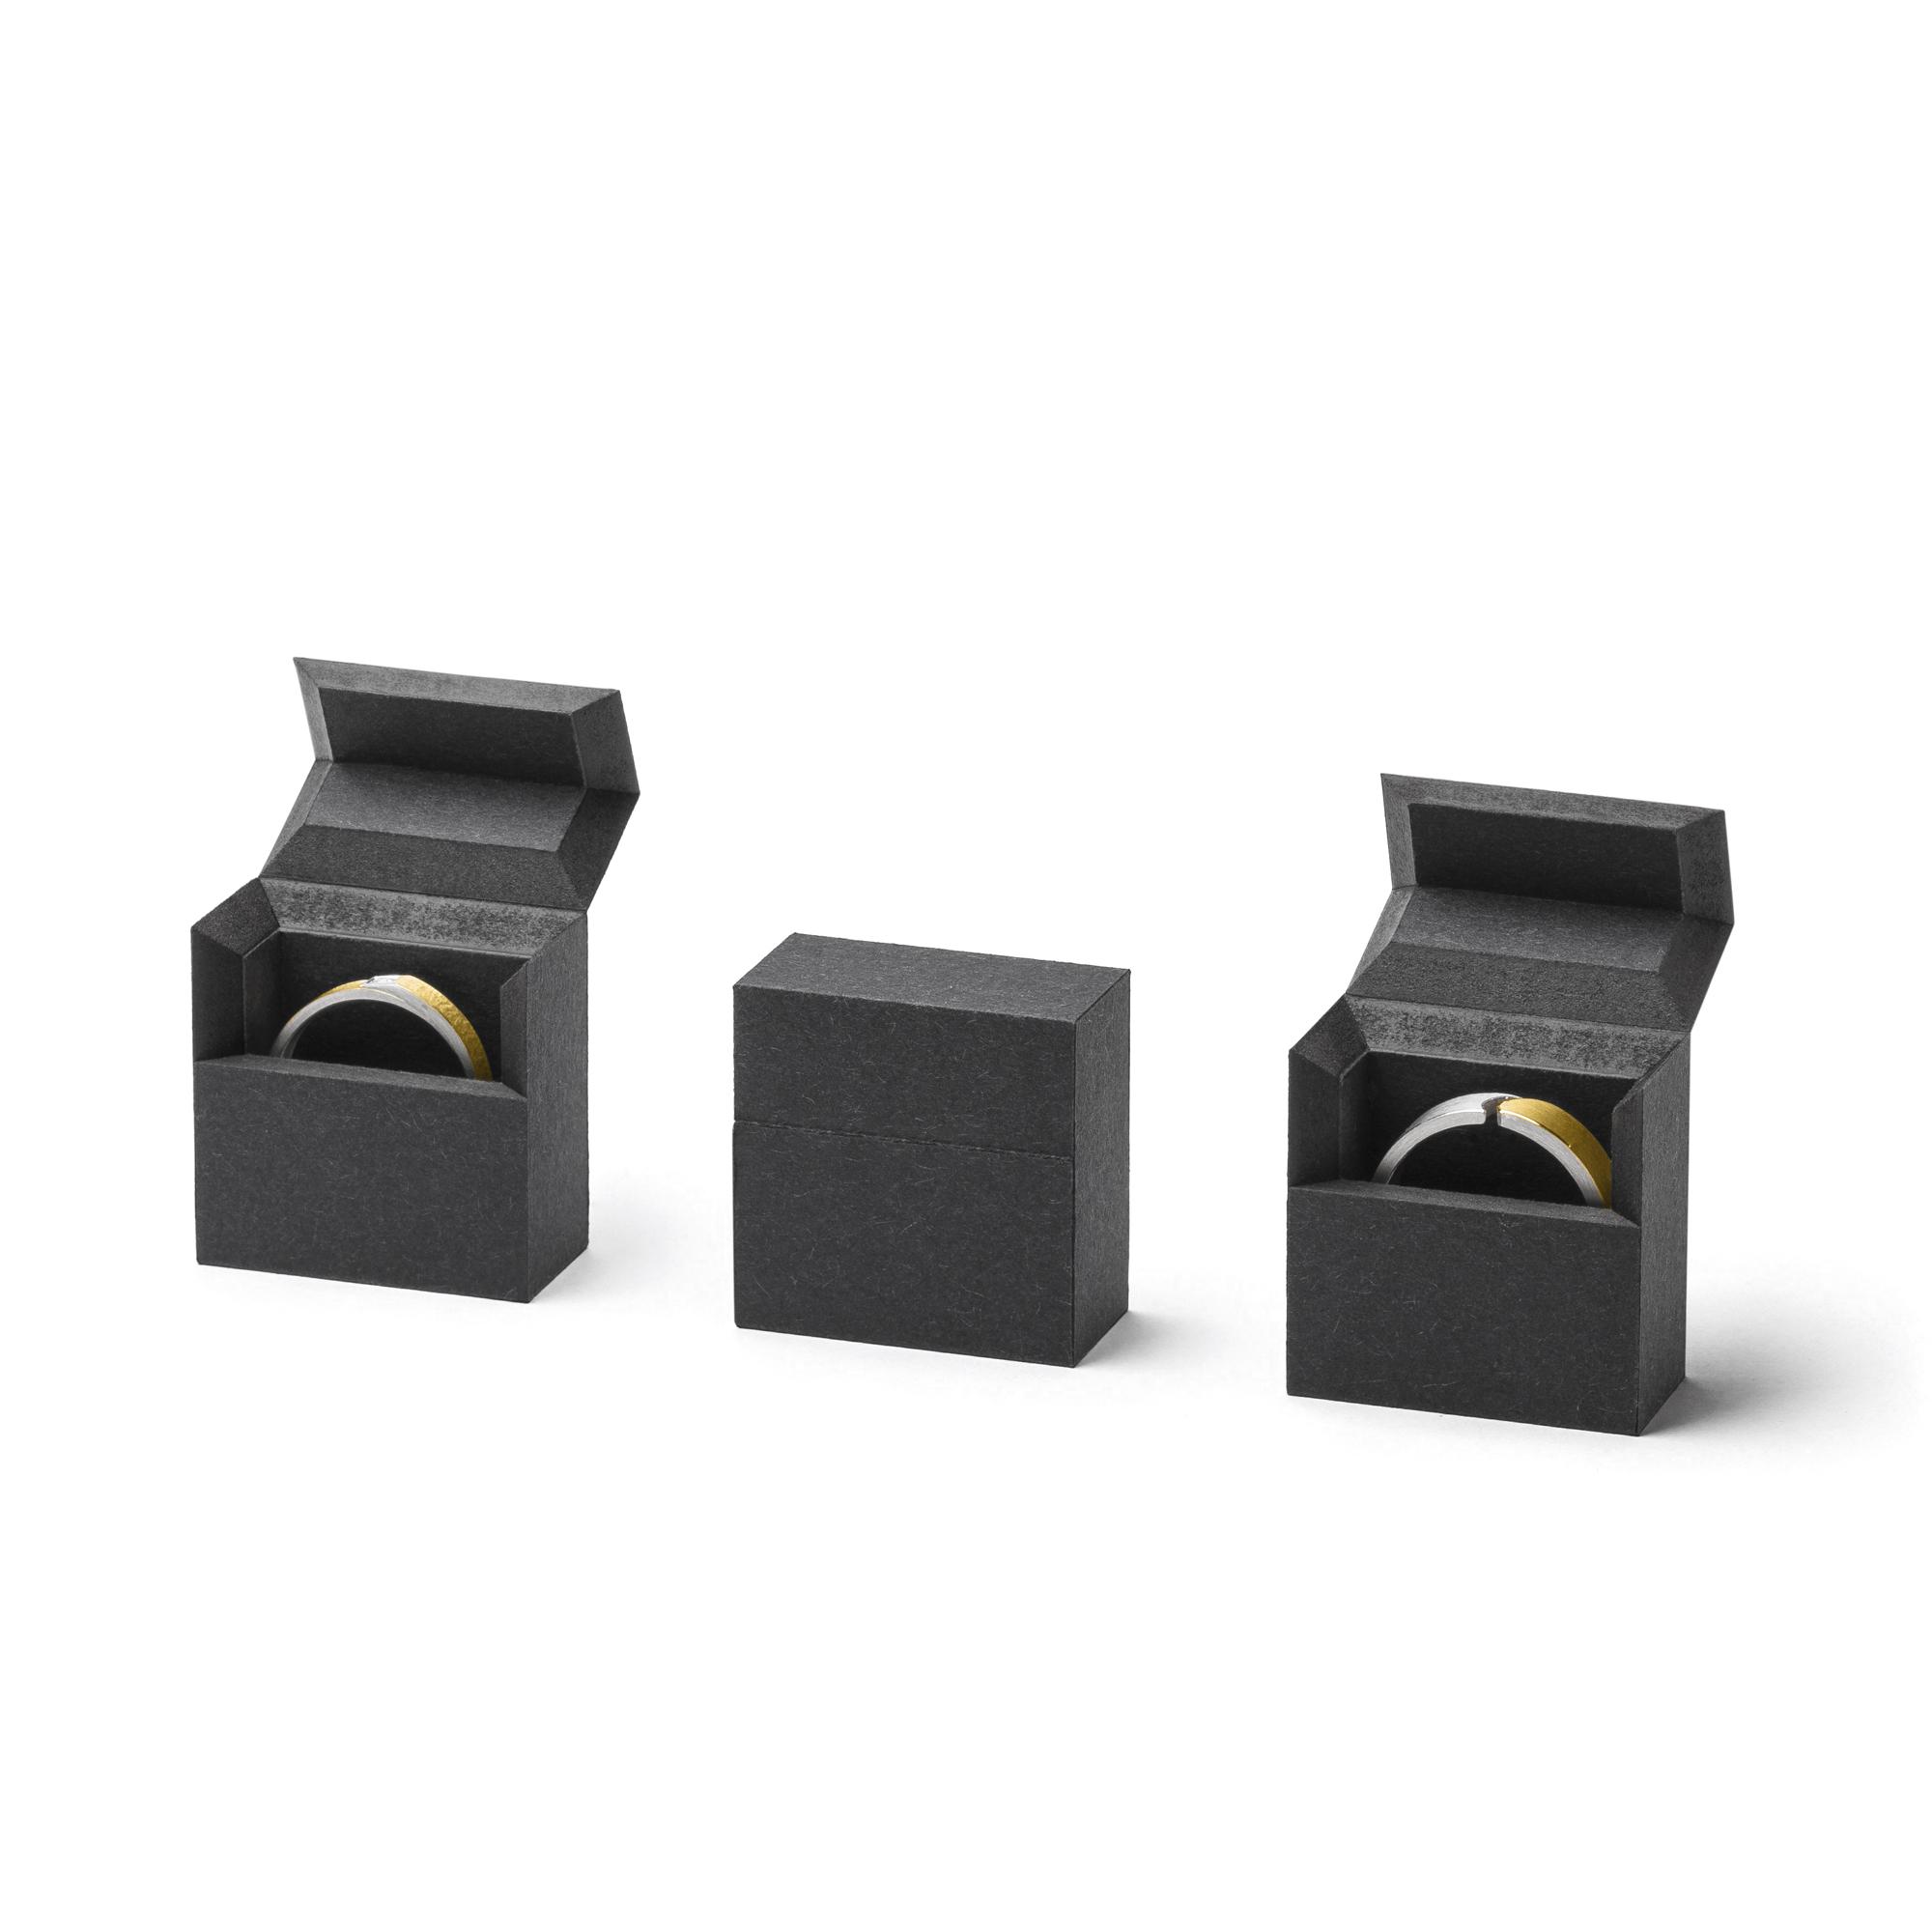 FLATLINE Box mini